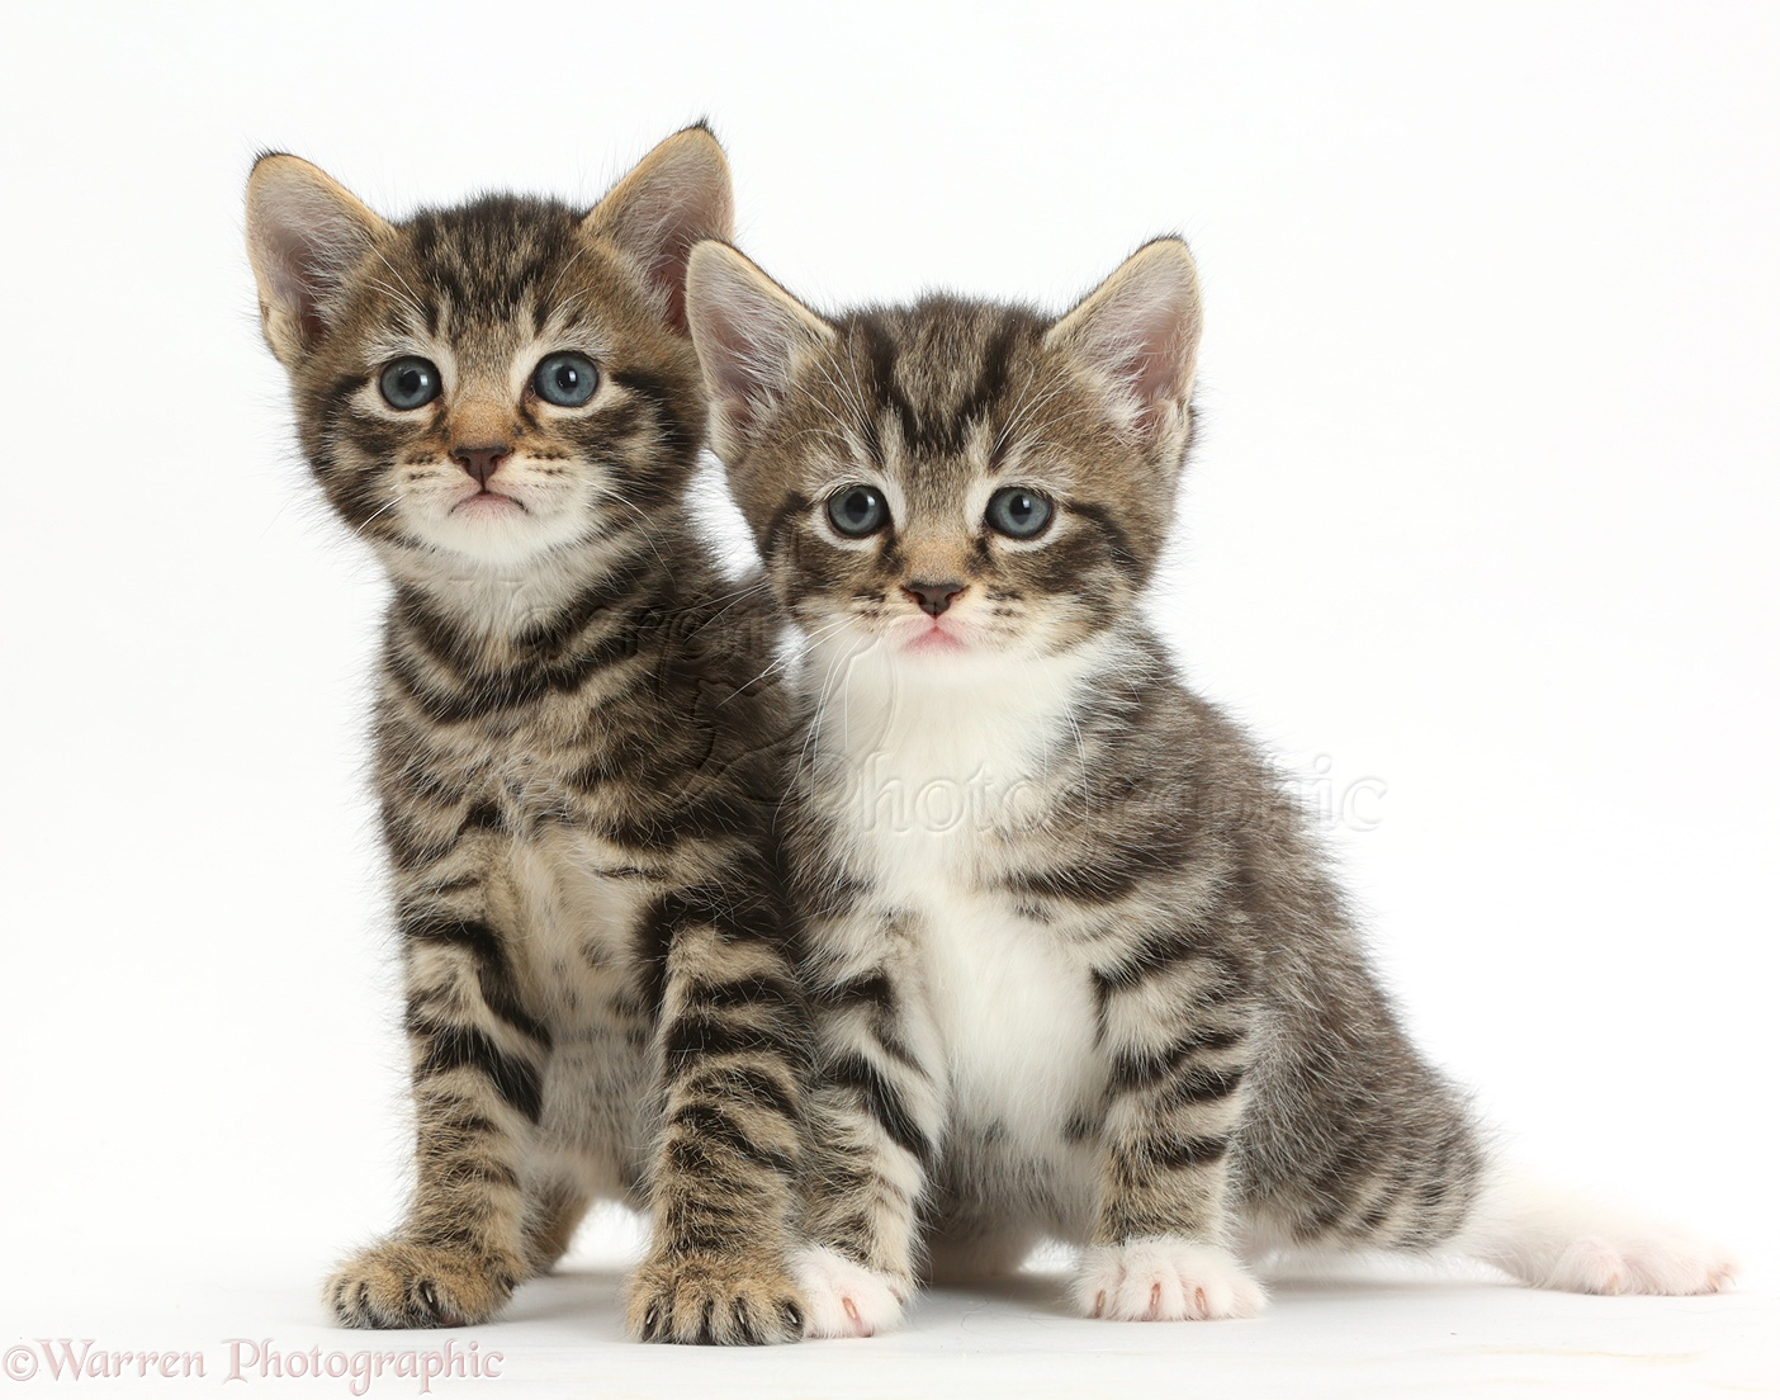 Cute tabby kittens photo WP